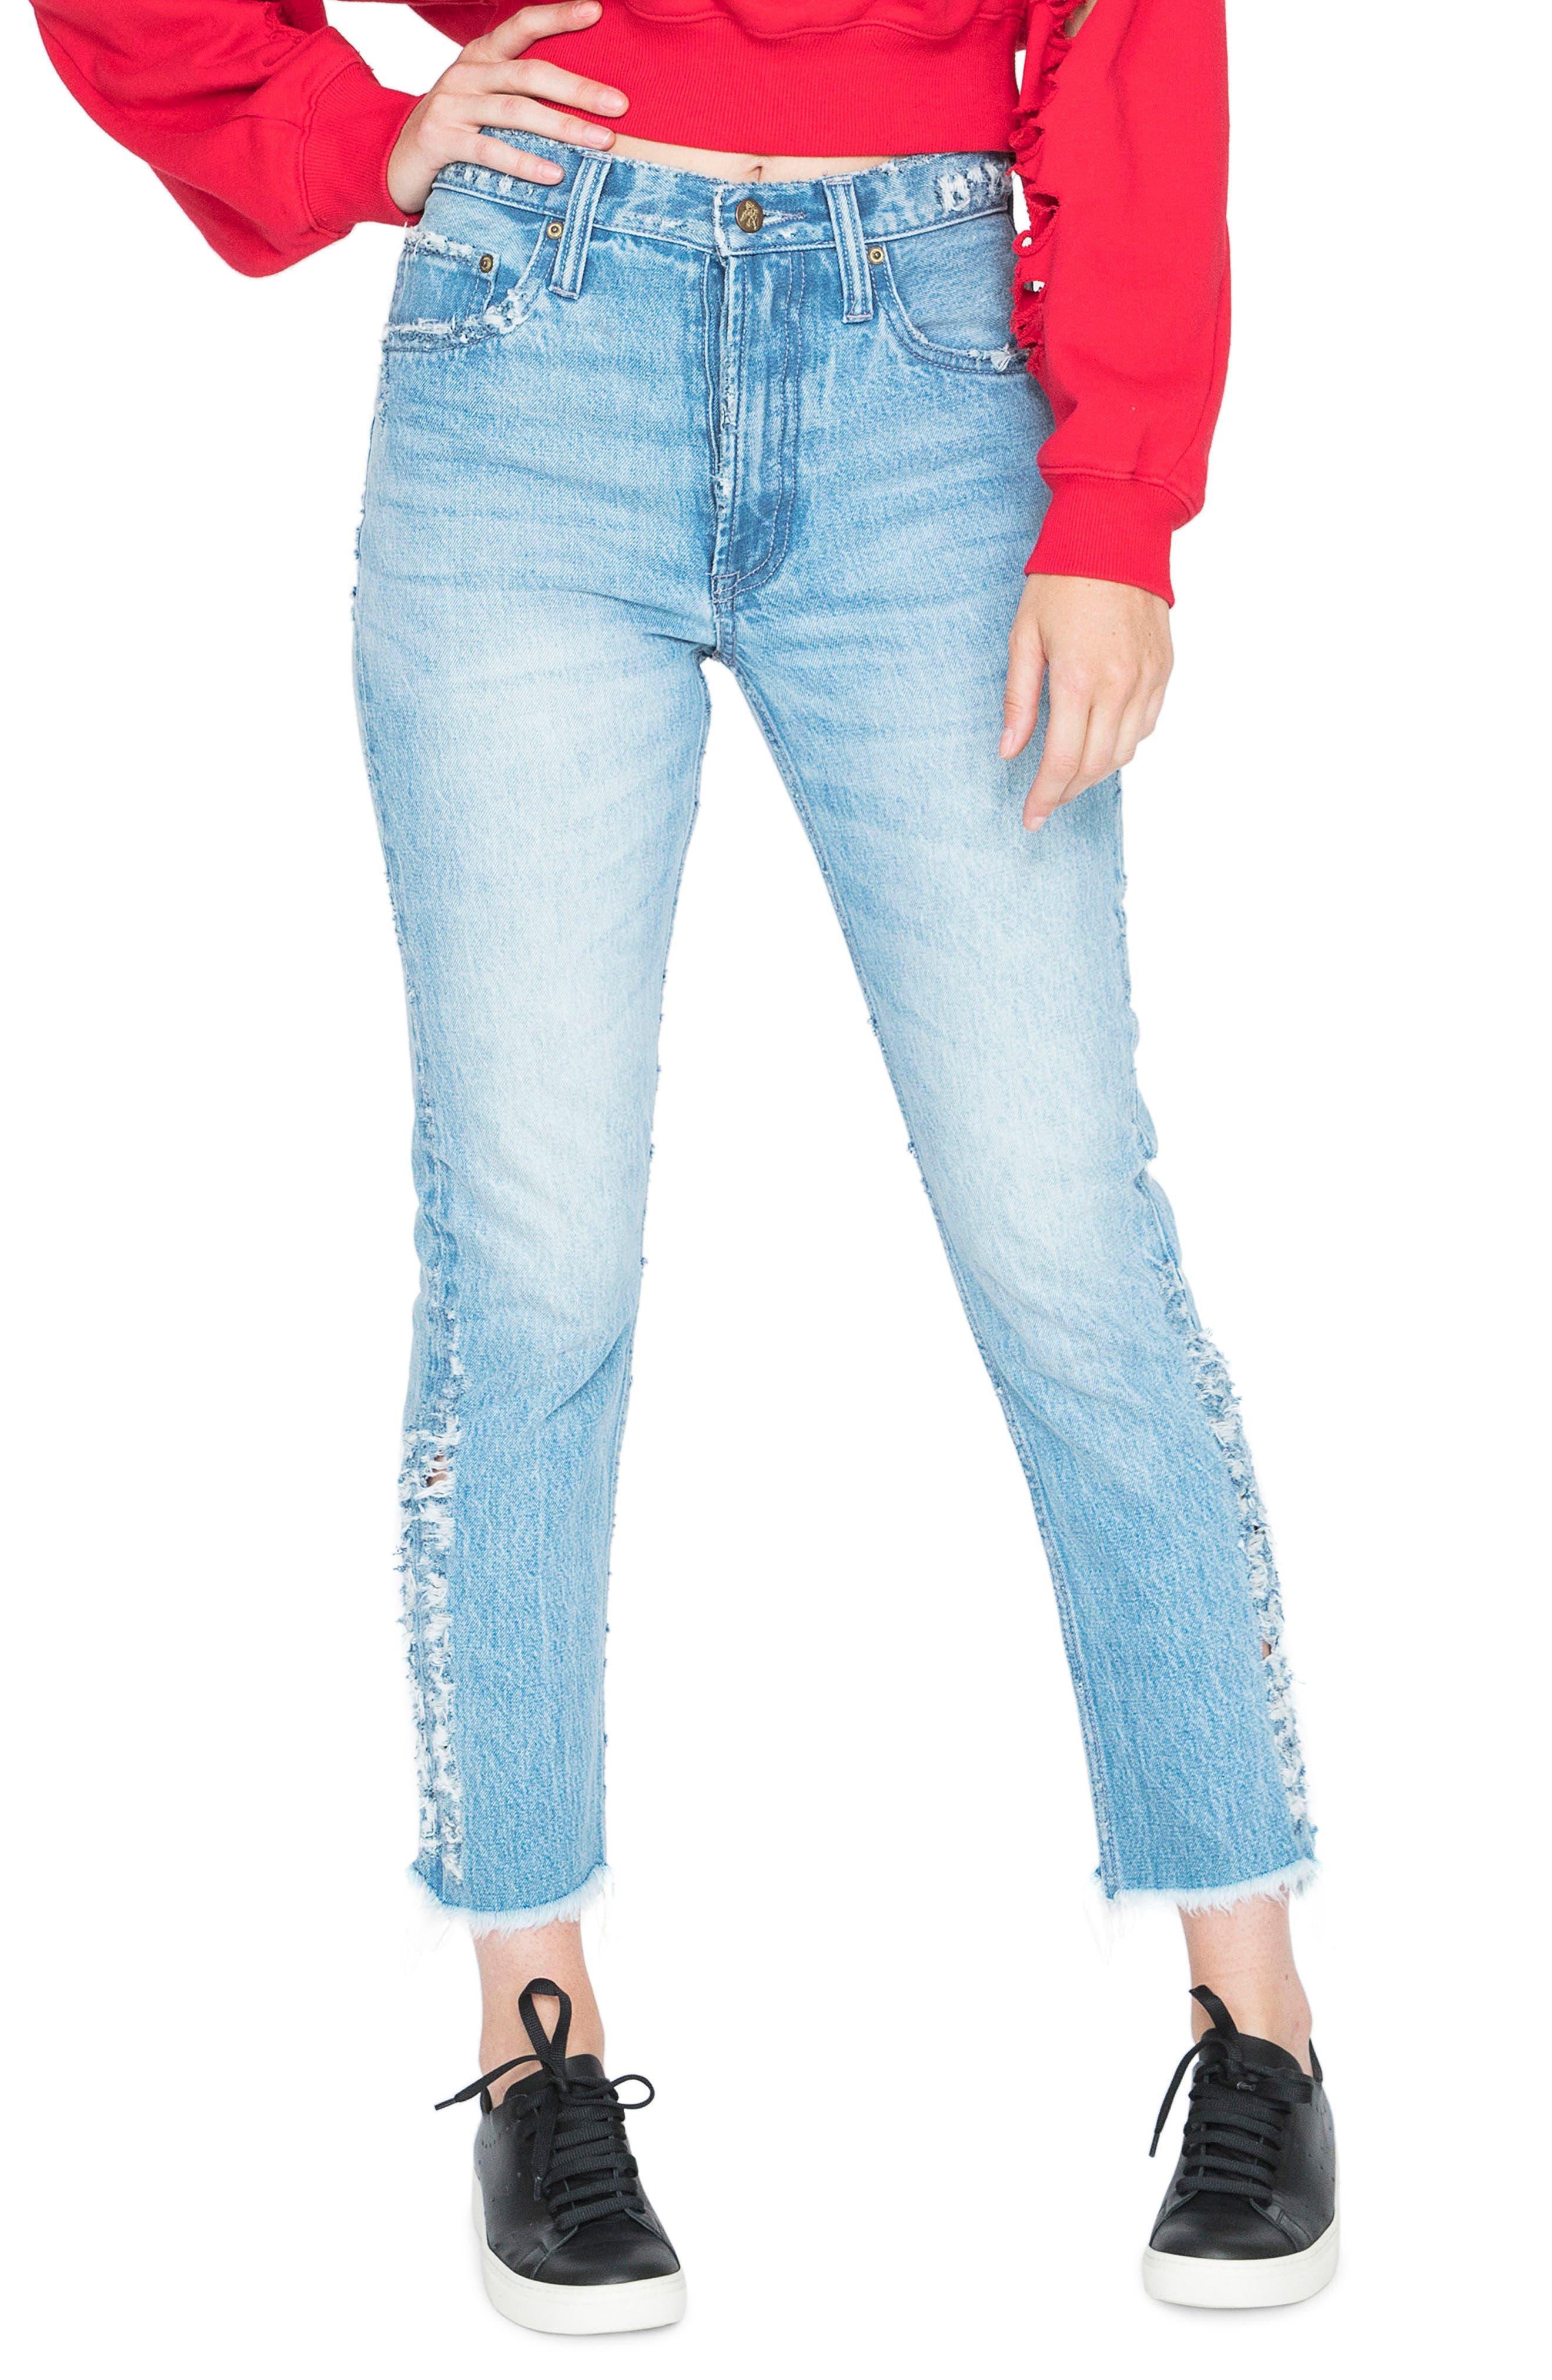 AMX Side Fray High Waist Ankle Jeans,                         Main,                         color, Light Stone